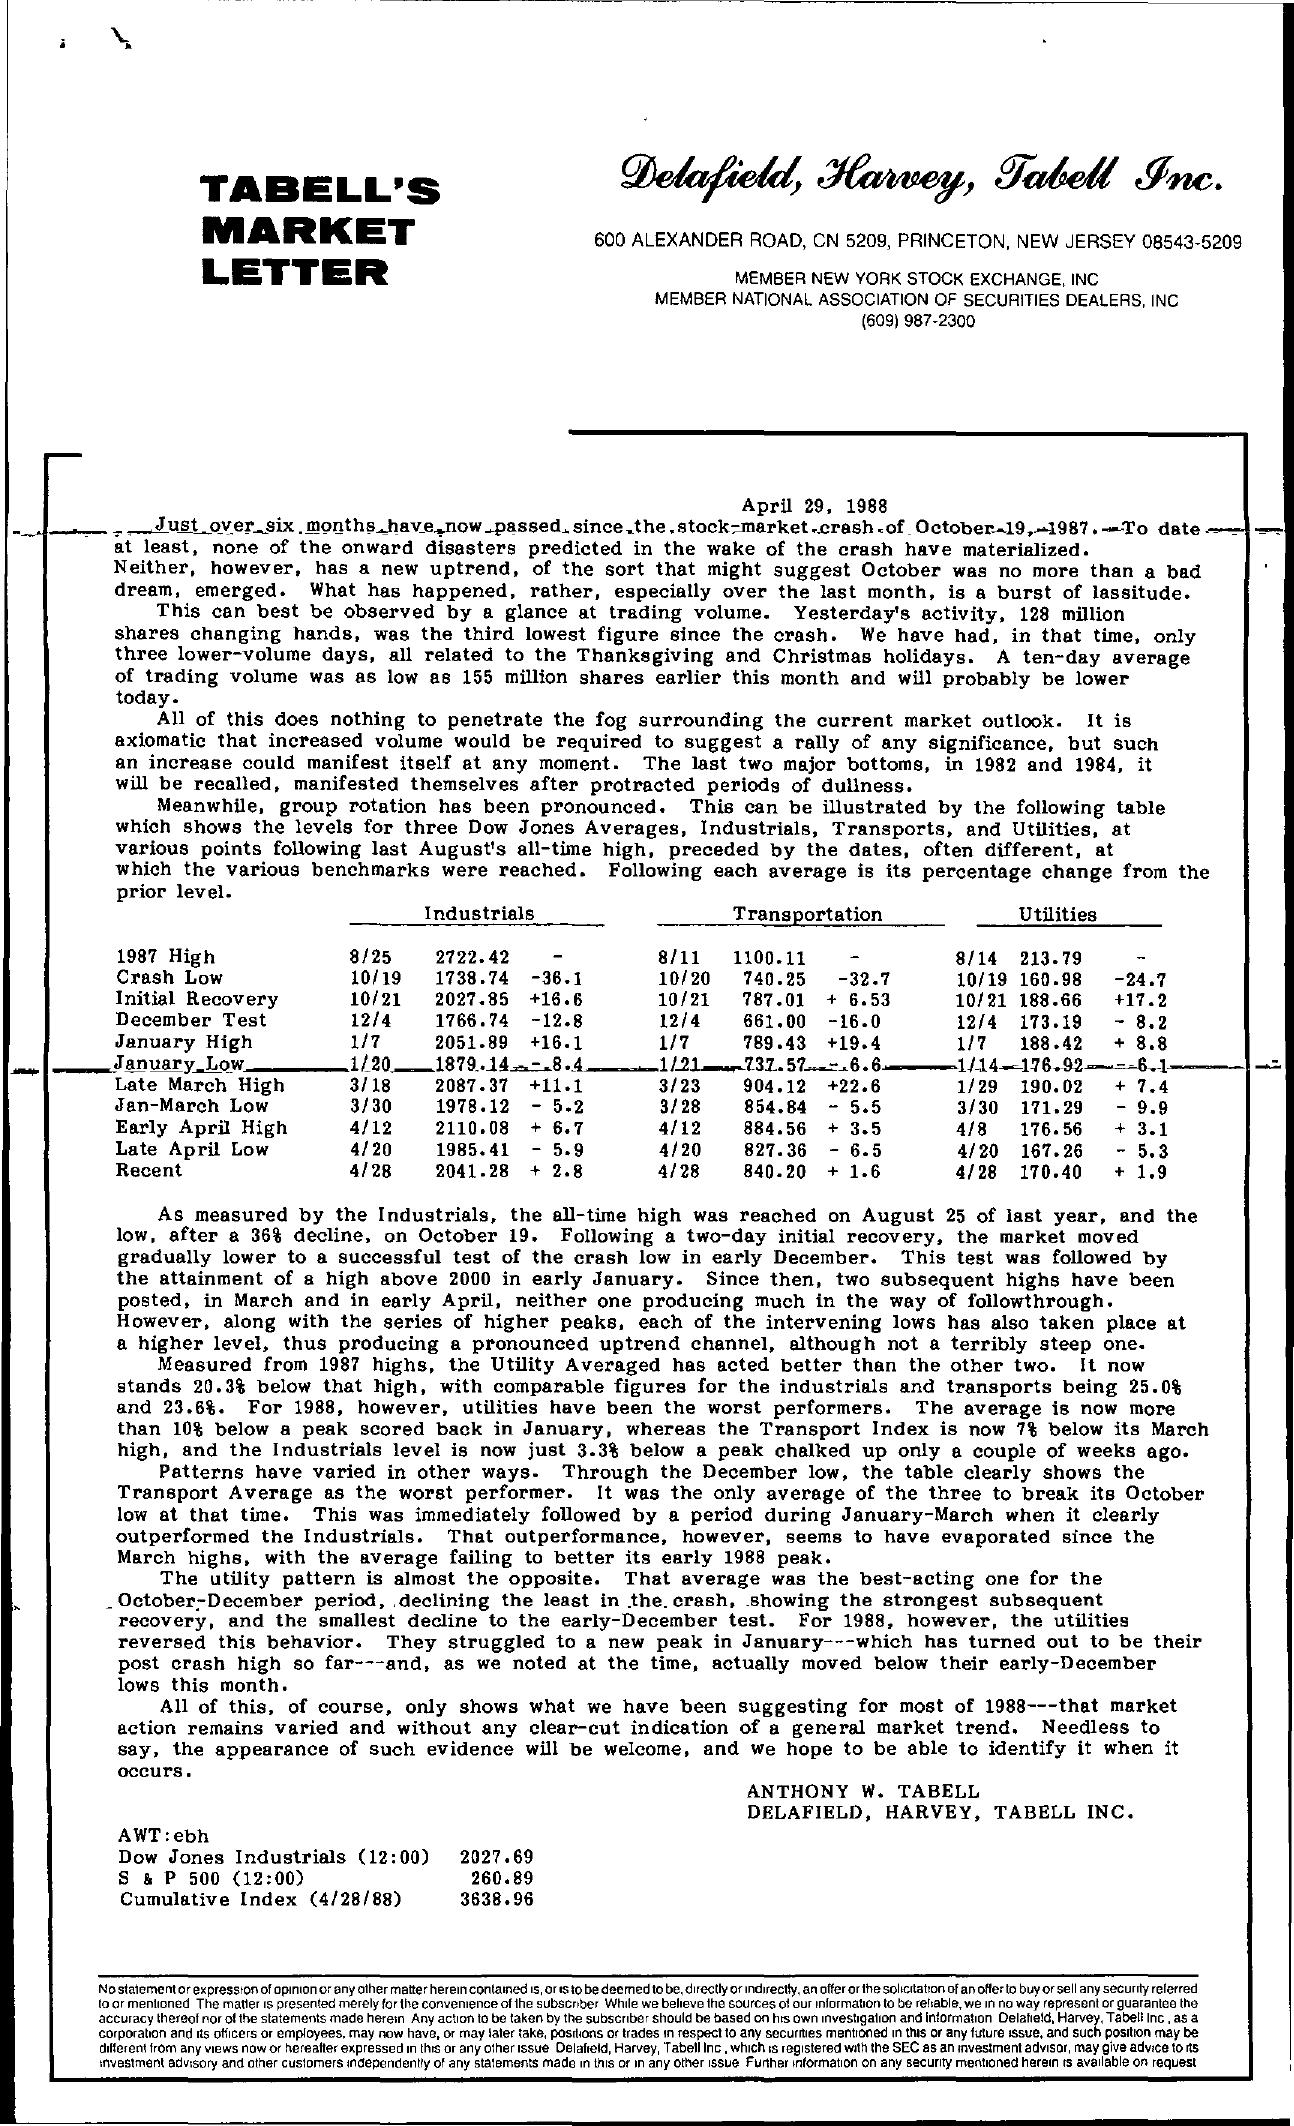 Tabell's Market Letter - April 29, 1988